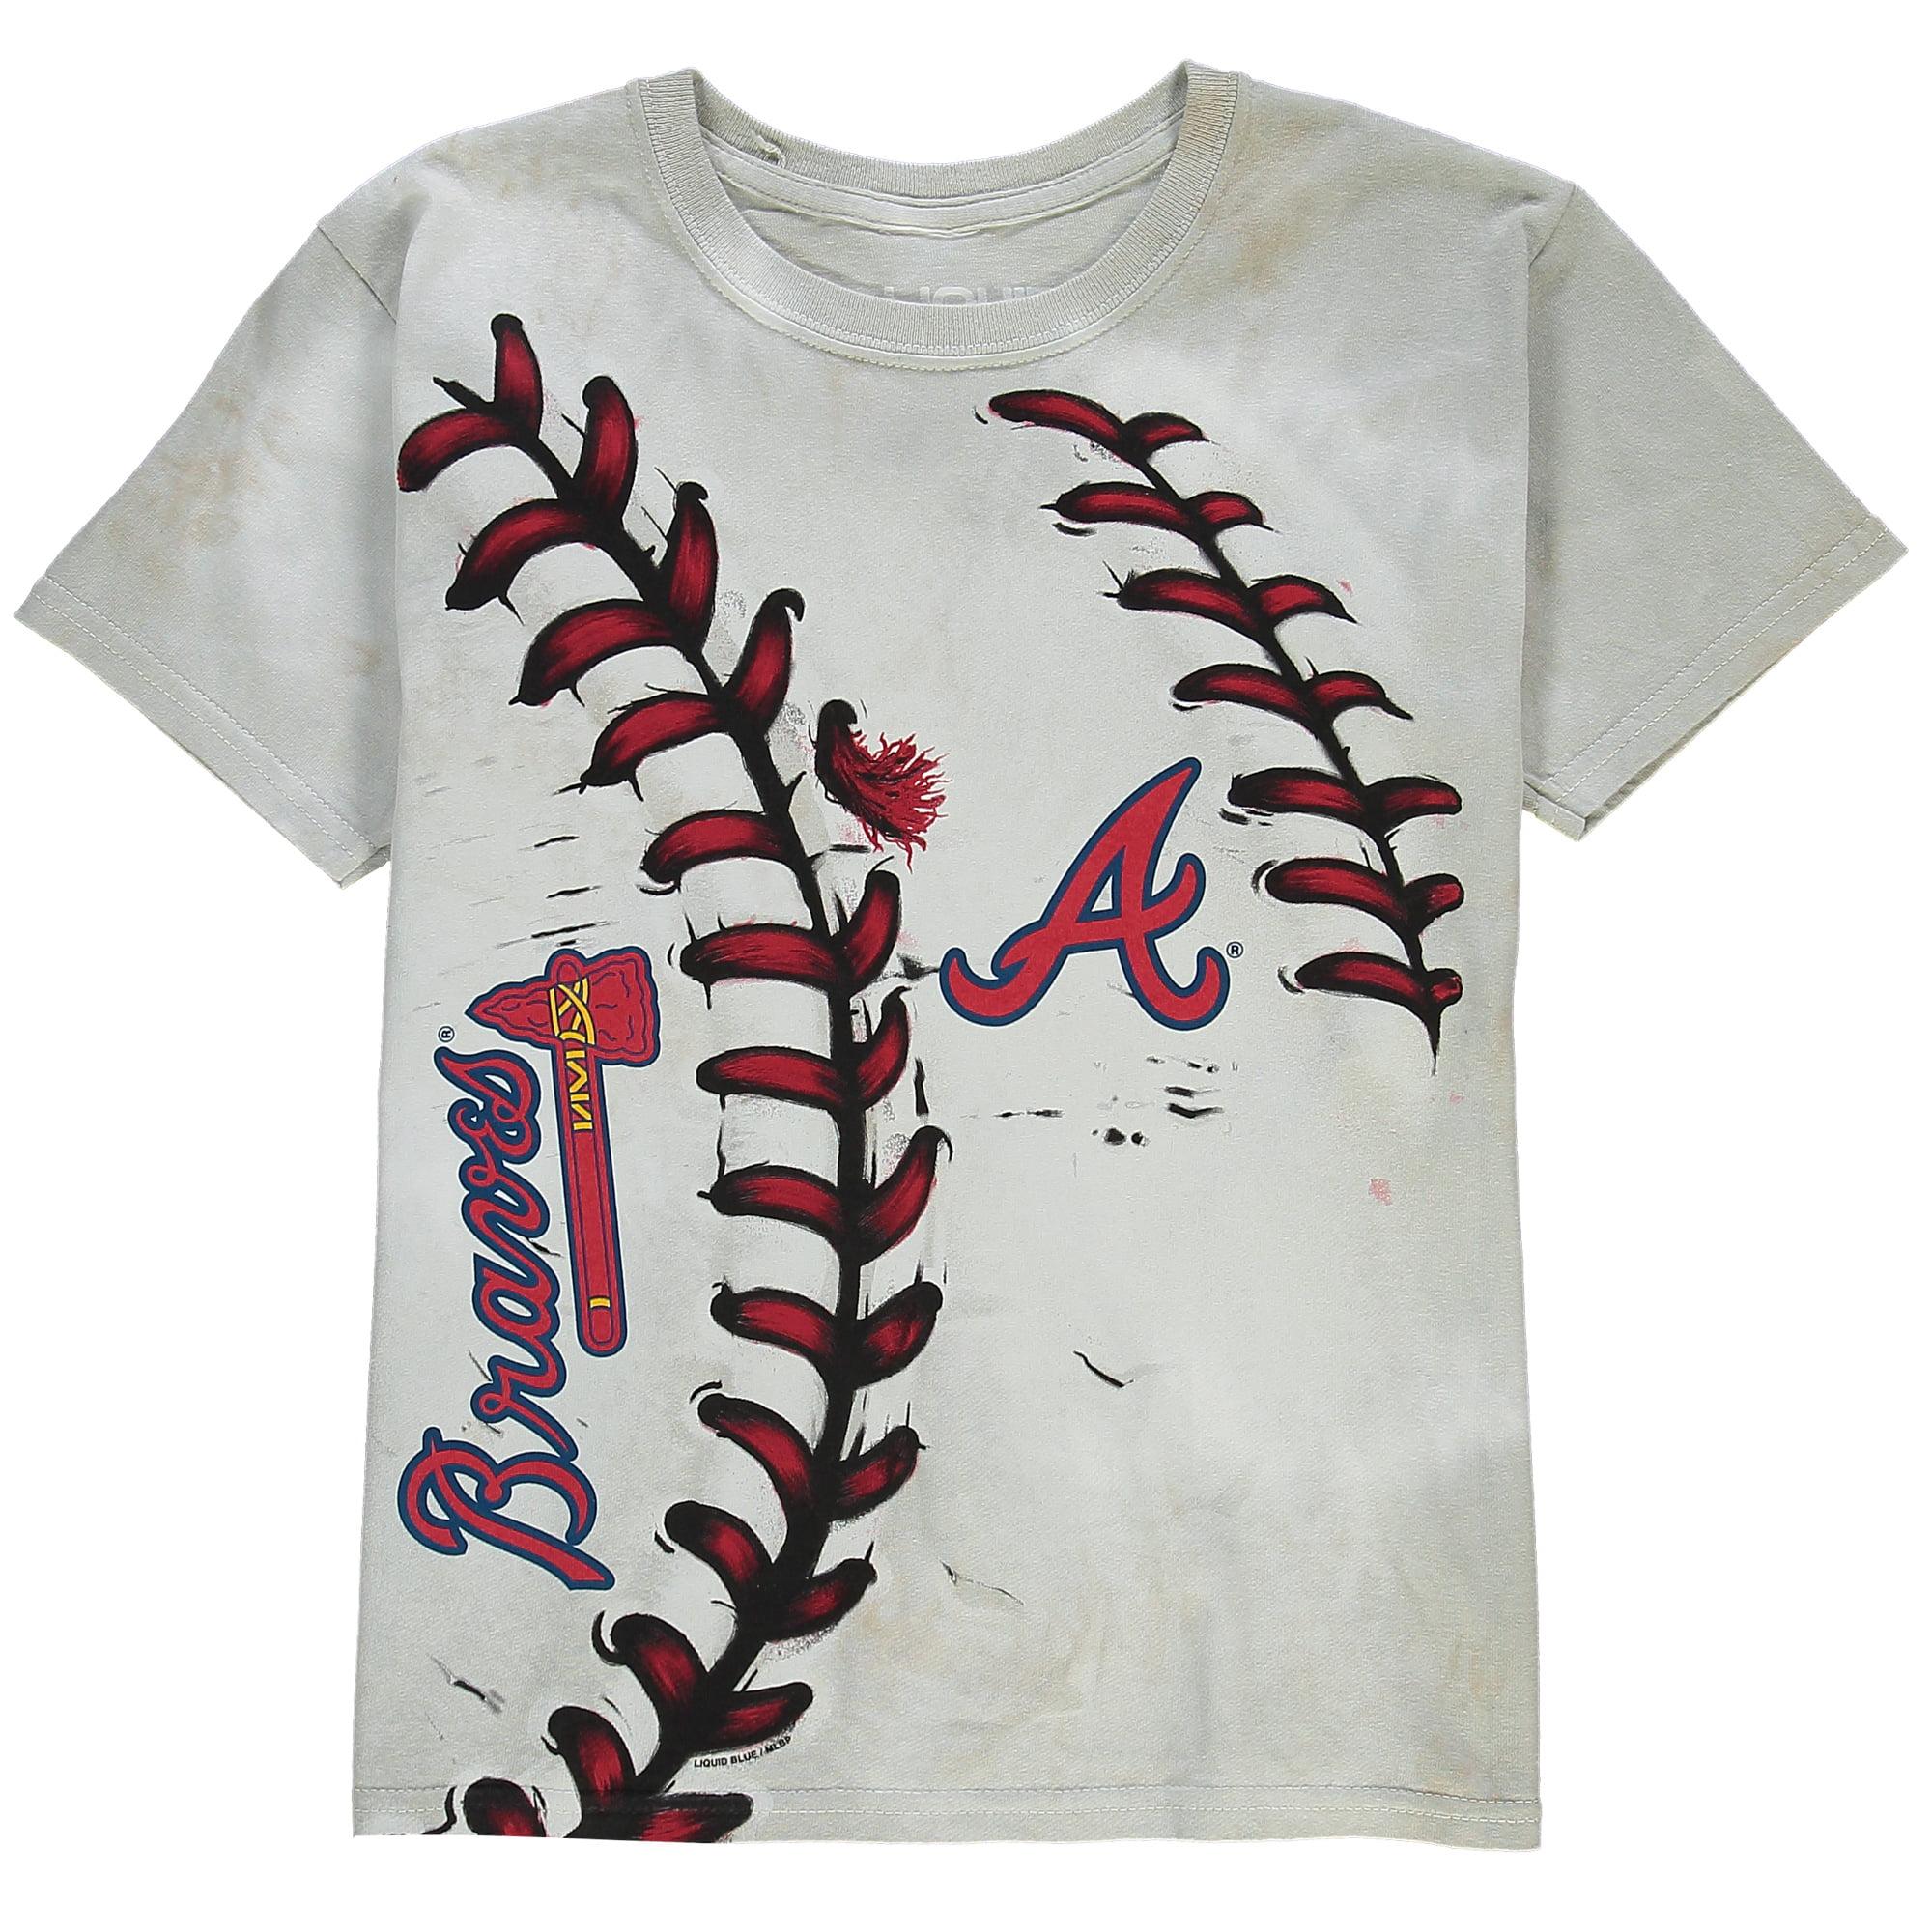 Atlanta Braves Youth Hardball T-Shirt - Cream